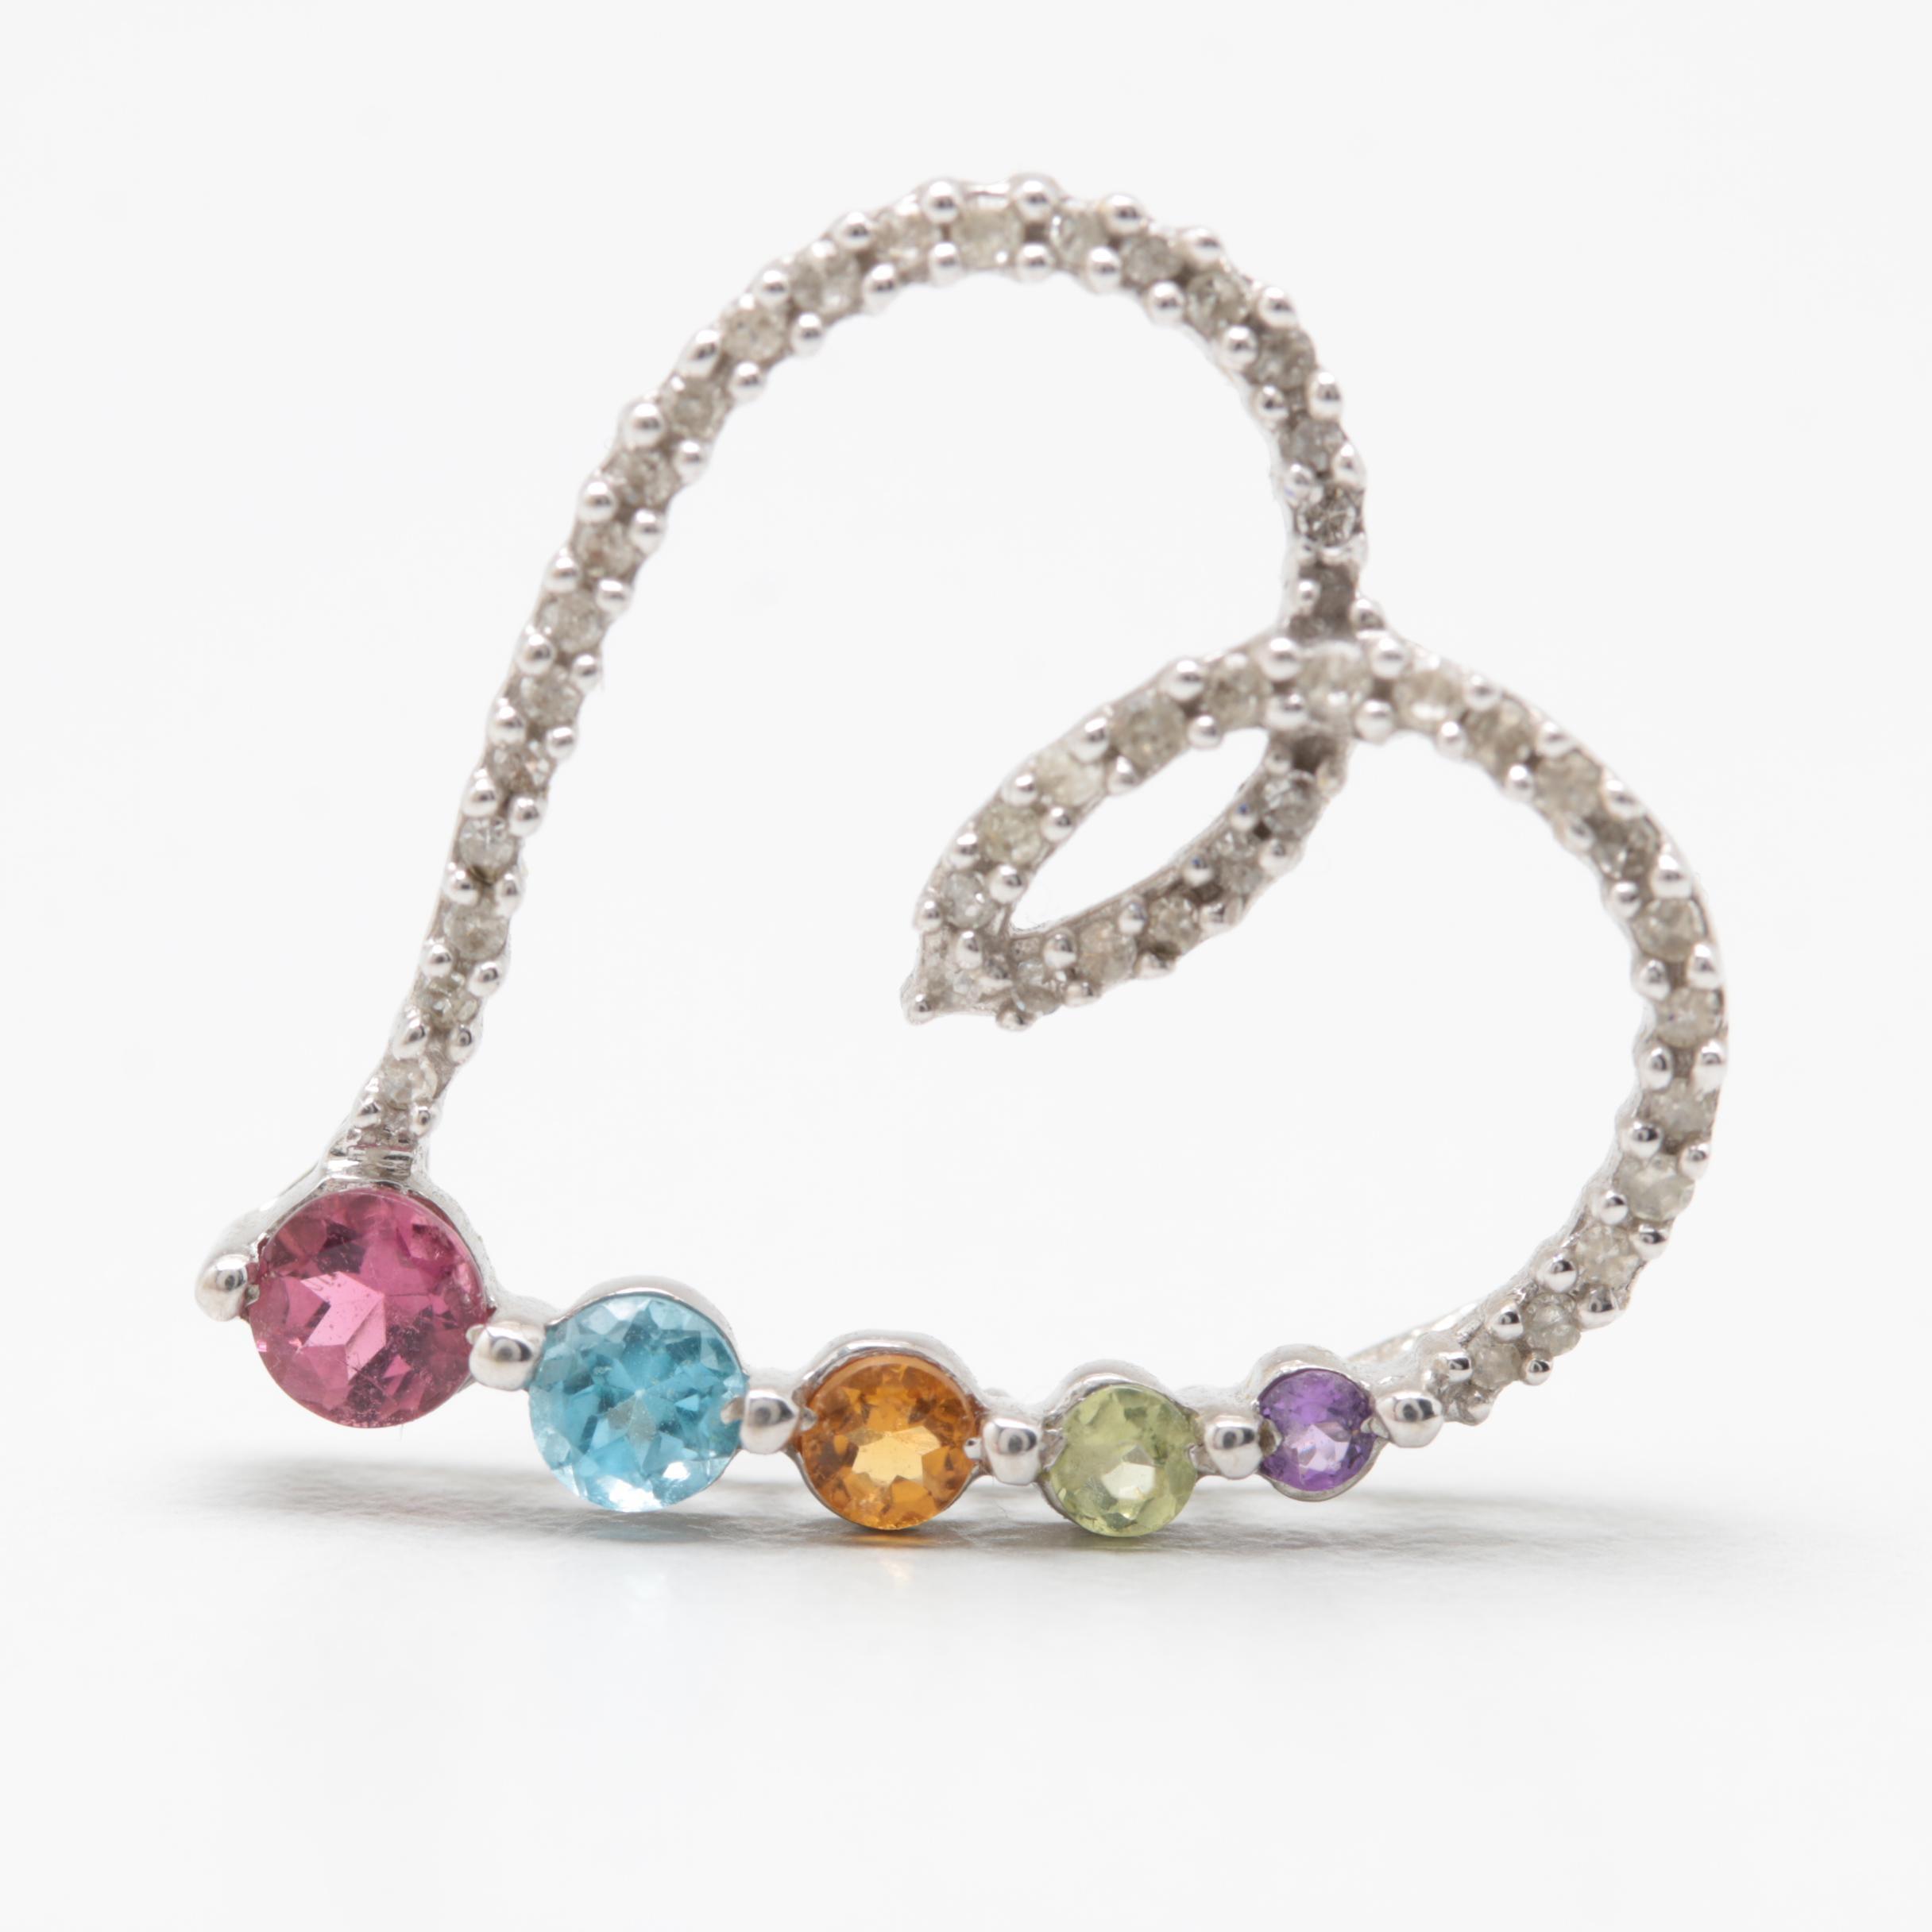 10K White Gold Diamond, Peridot, Citrine, Blue Topaz and Garnet Heart Pendant